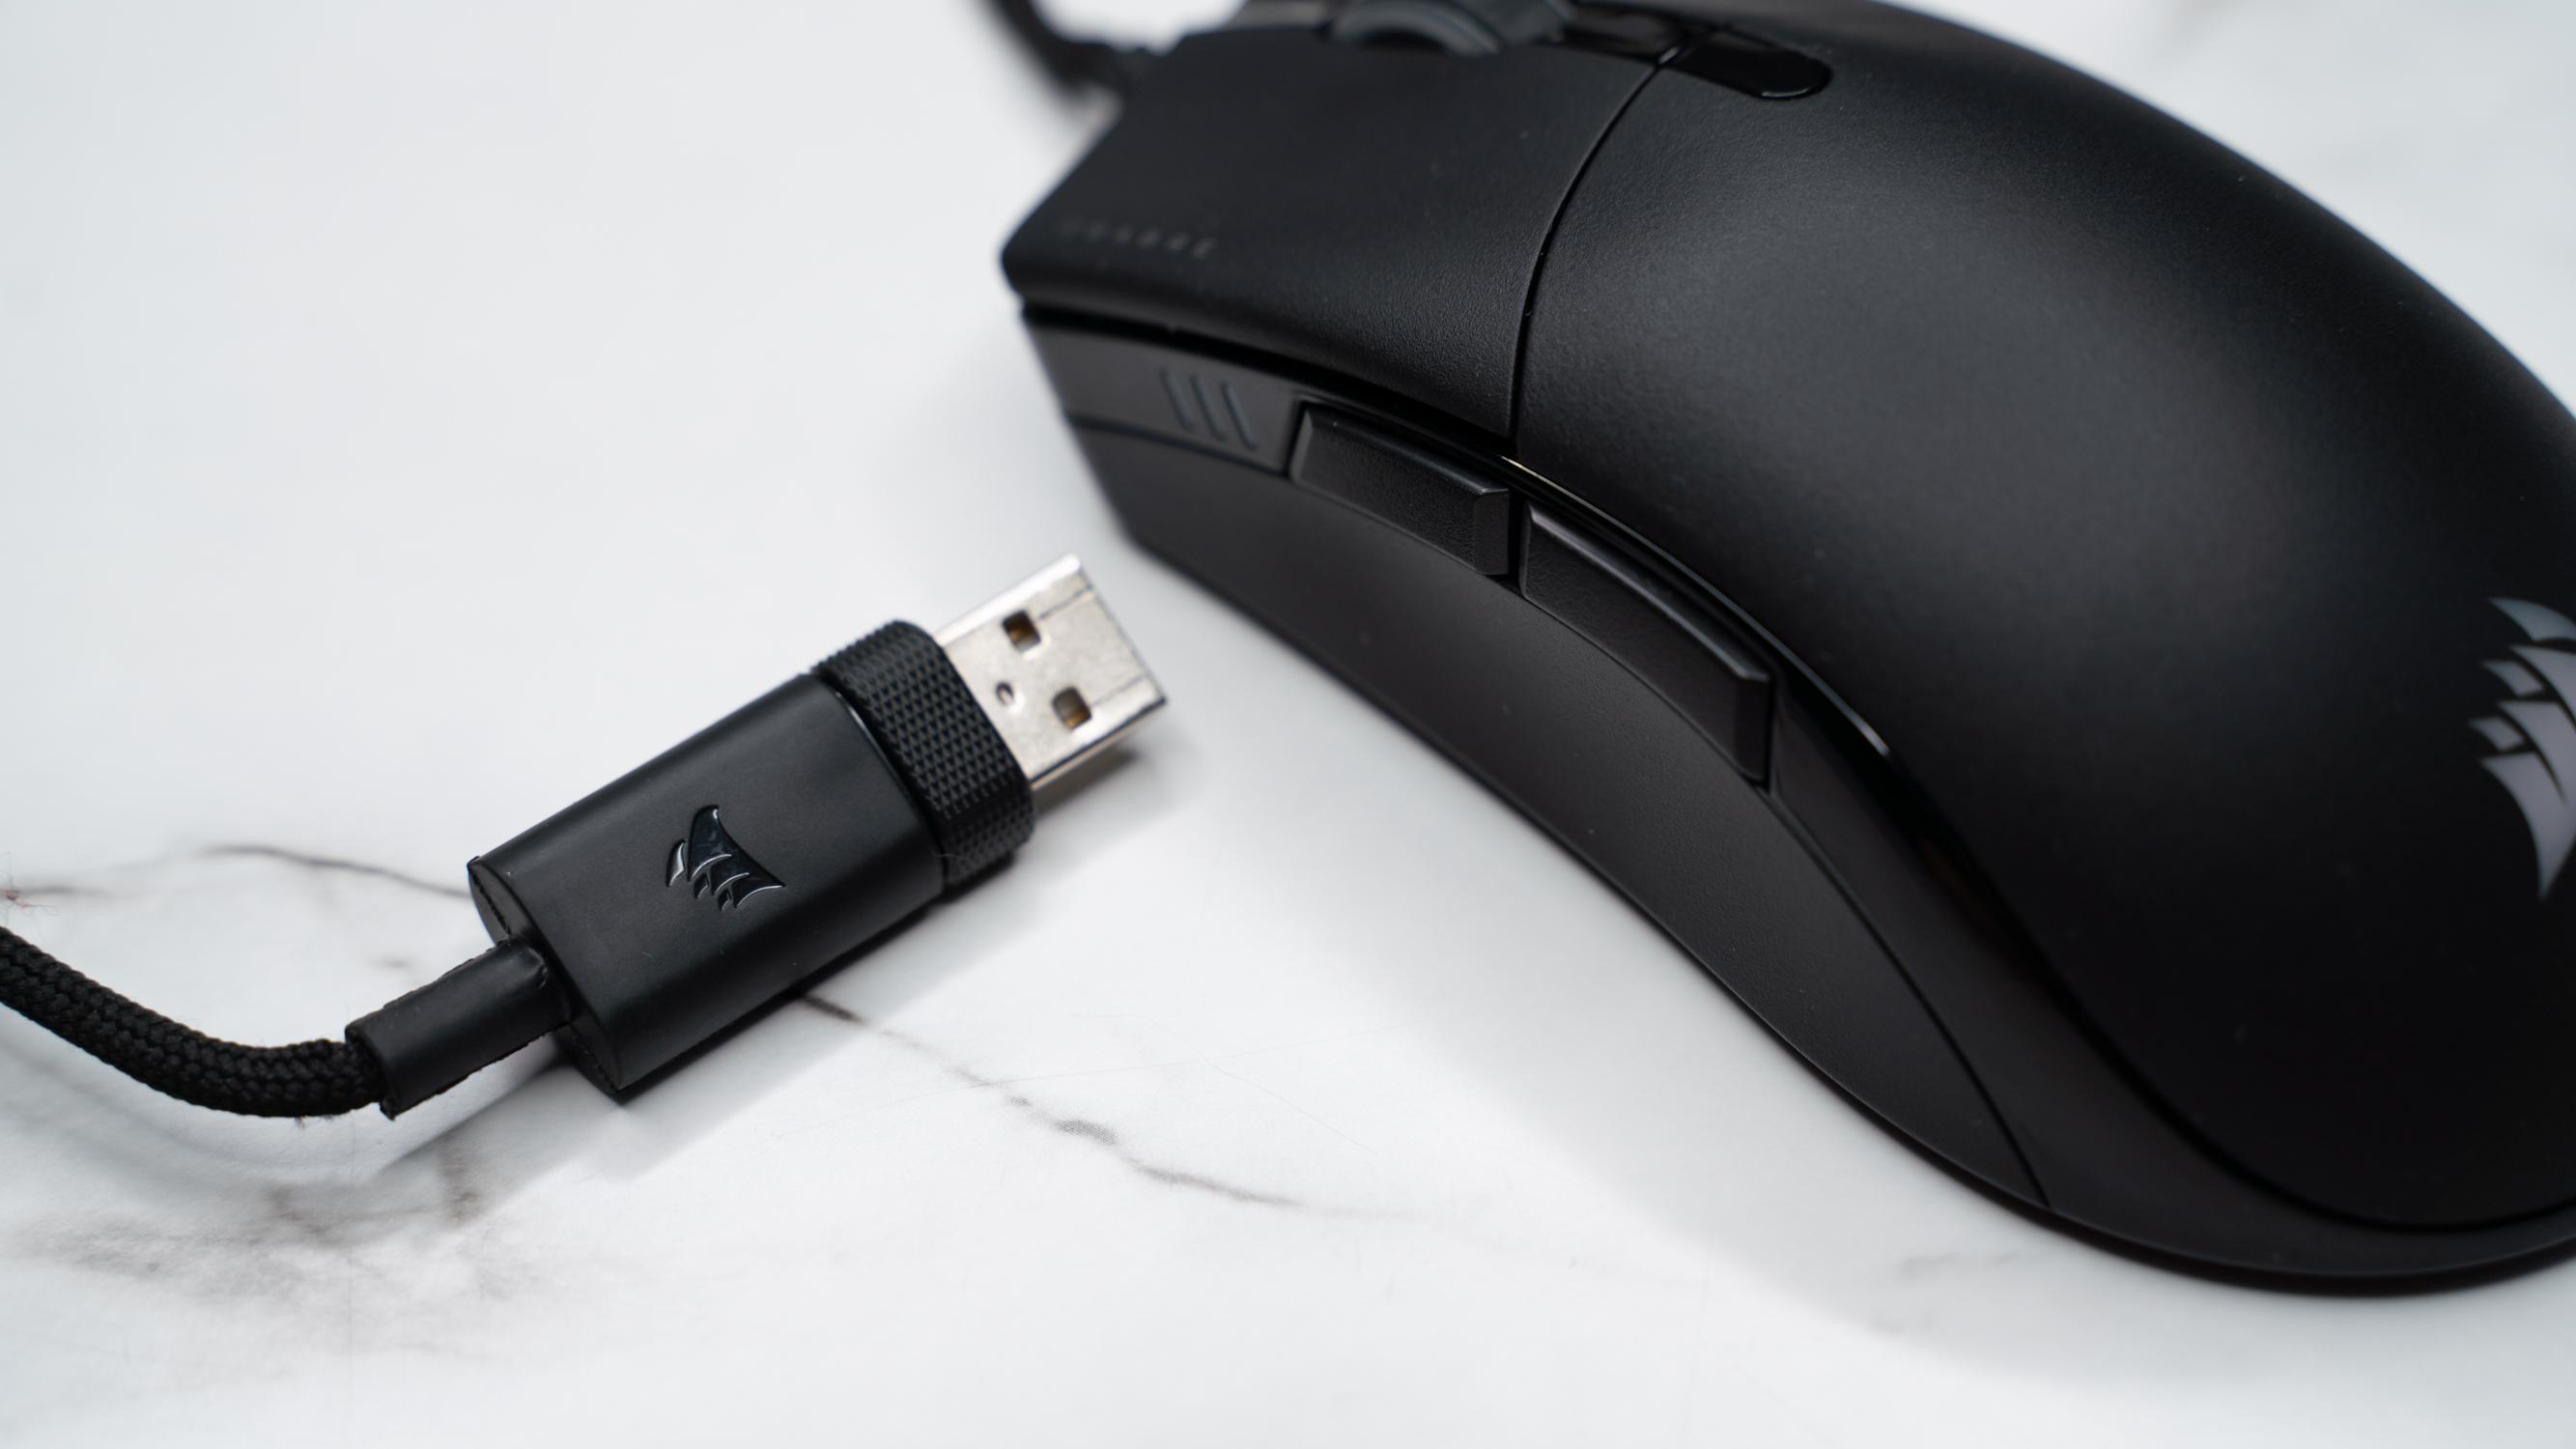 The Corsair Sabre RGB Pro Champion Series has USB connectivity.